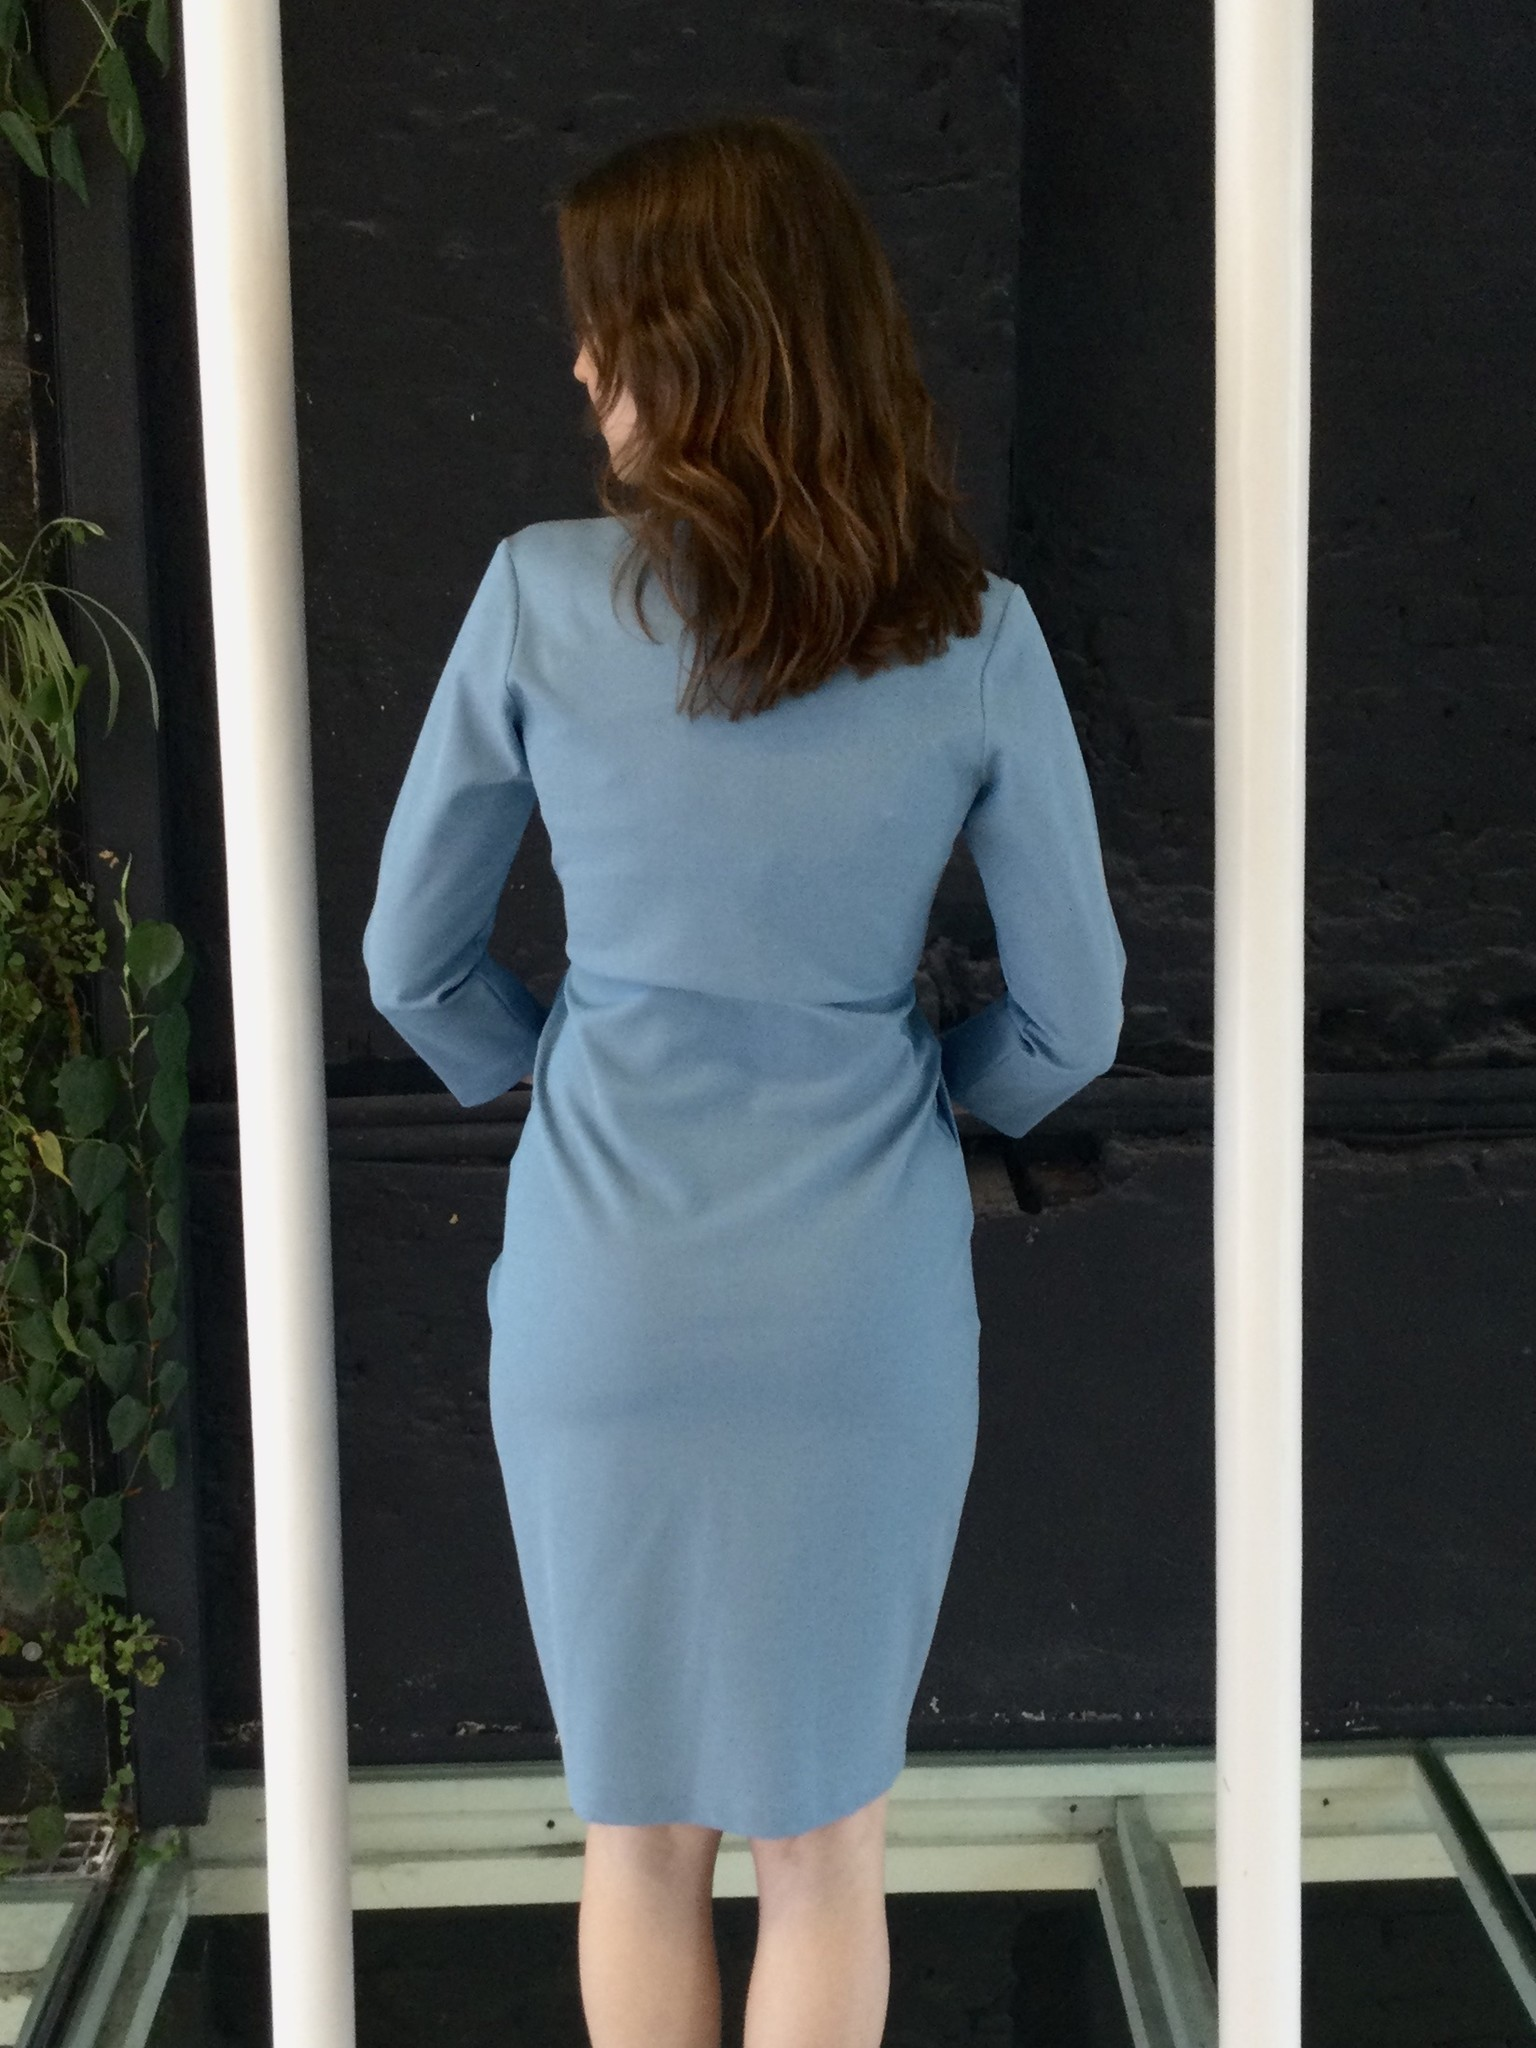 Comfy Dress 7/8 Sleeves Blue Sparkle-3